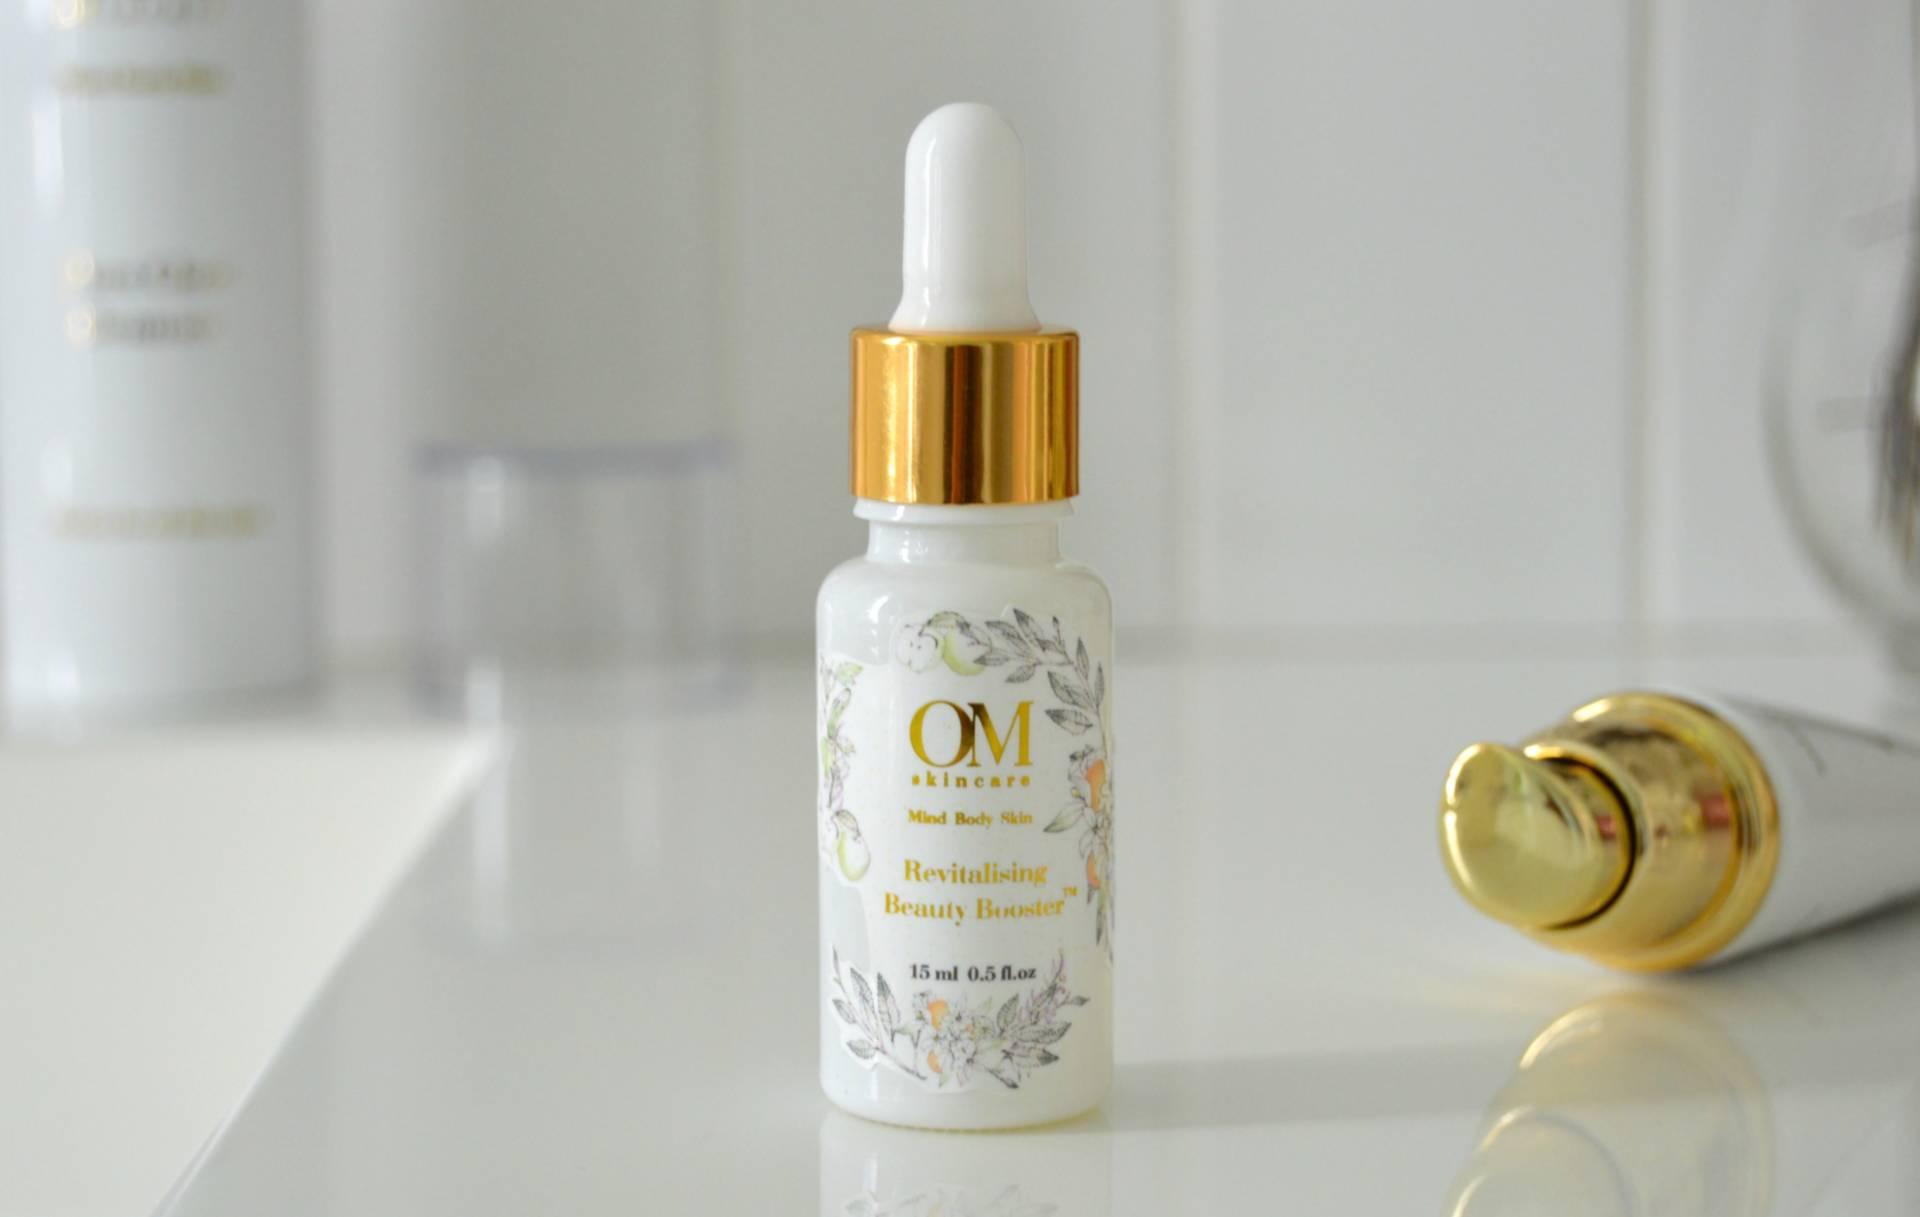 om skincare revitalizing beauty booster review inhautepursuit